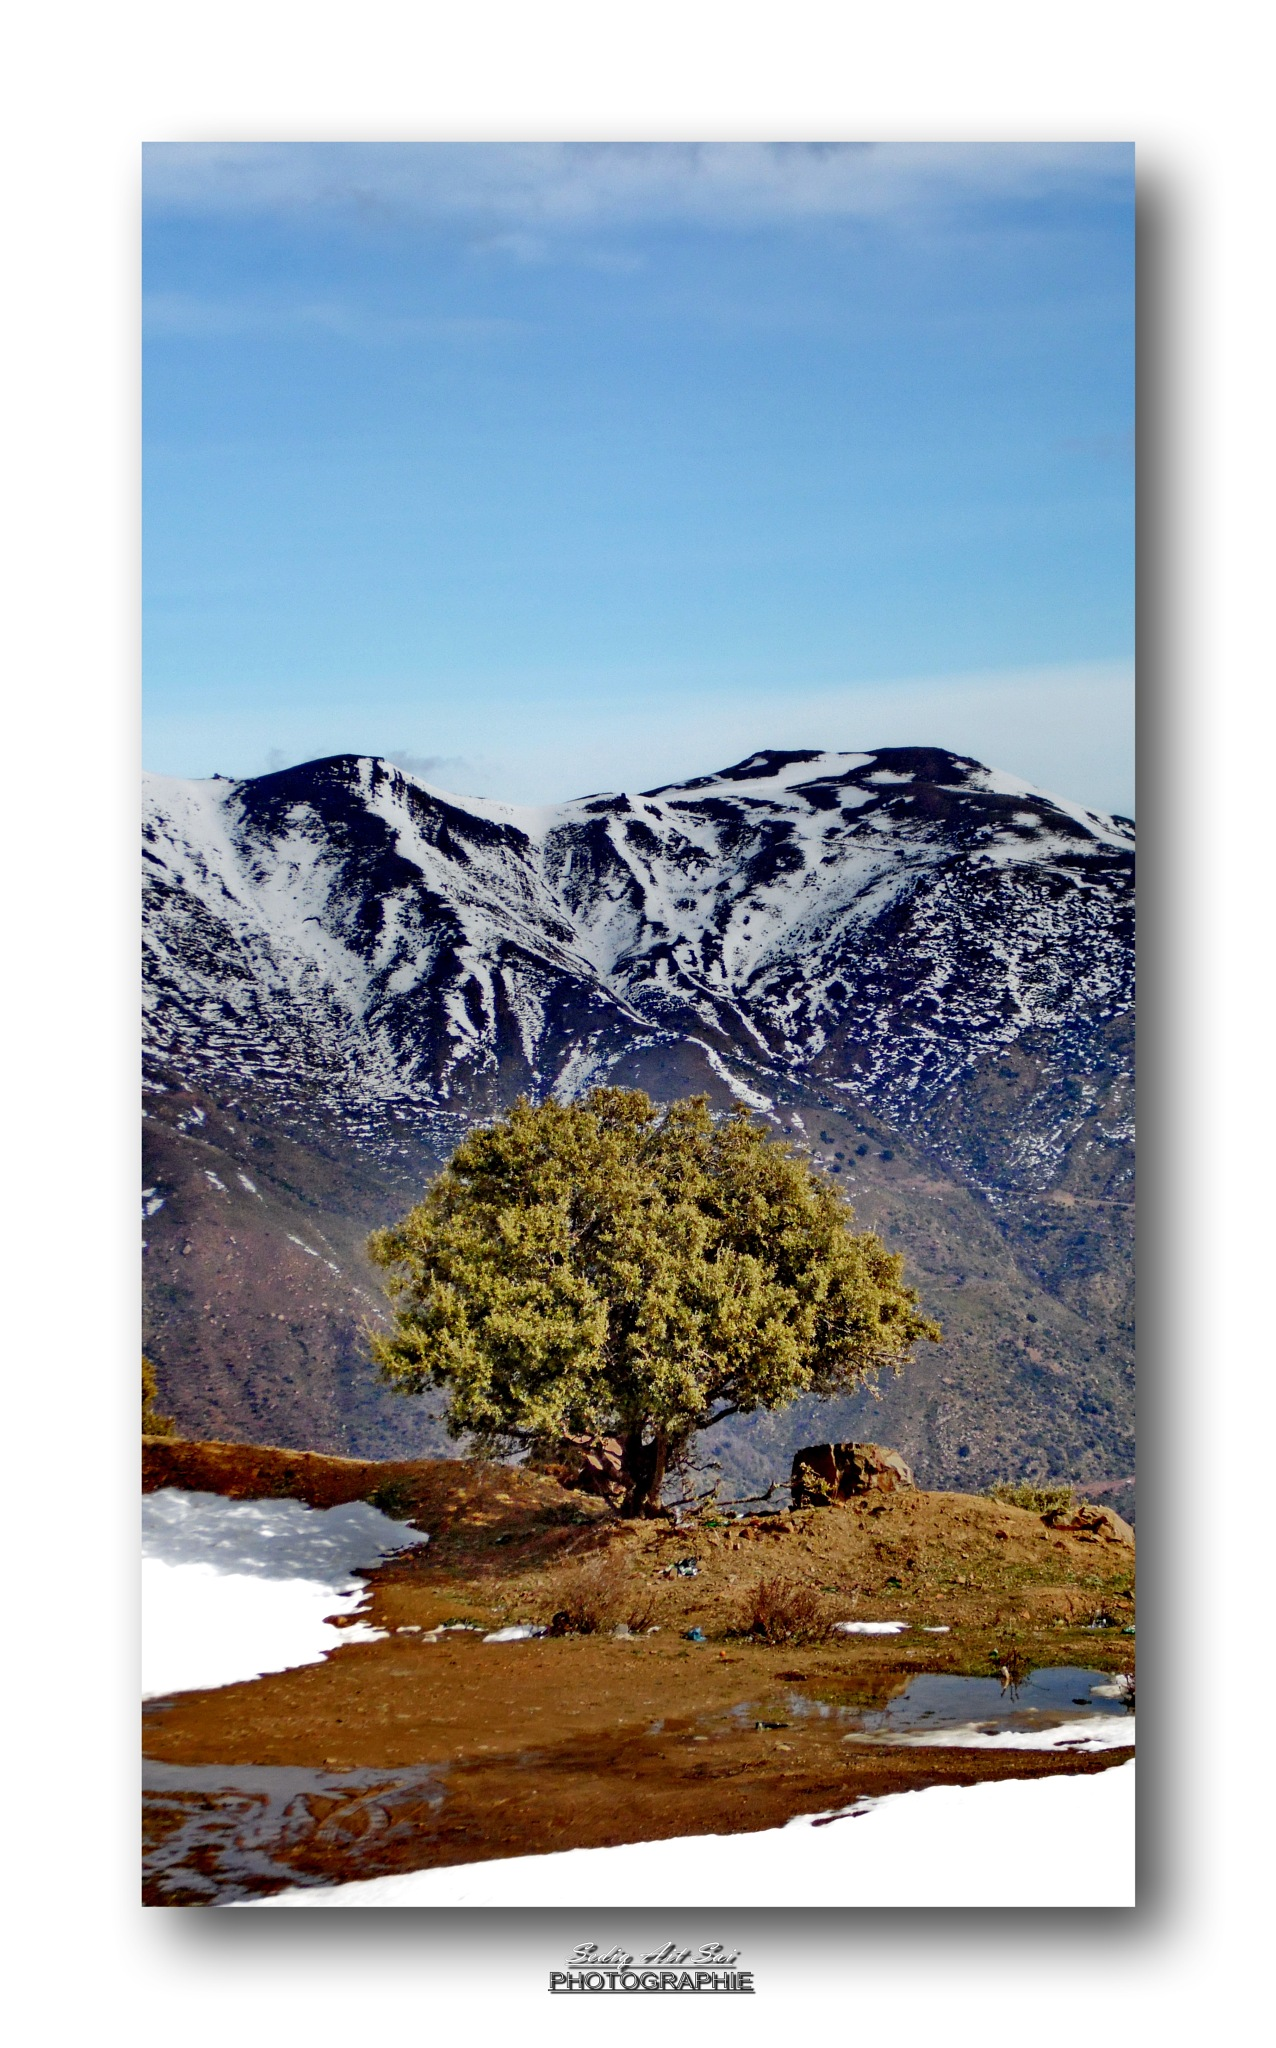 Tirourda, Algéria  by Seddik Ait Sai